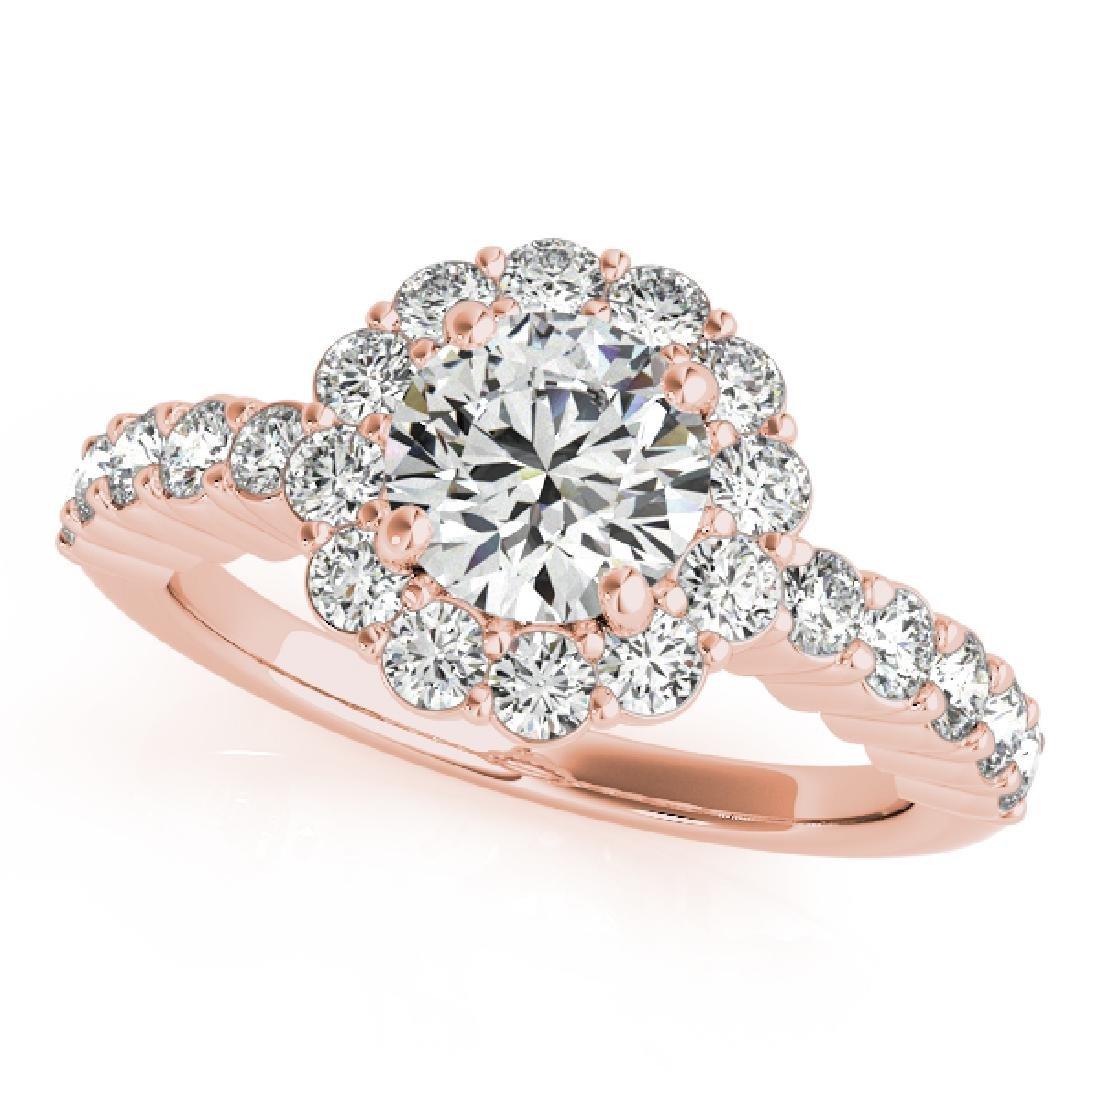 CERTIFIED 18K ROSE GOLD 1.21 CT G-H/VS-SI1 DIAMOND HALO